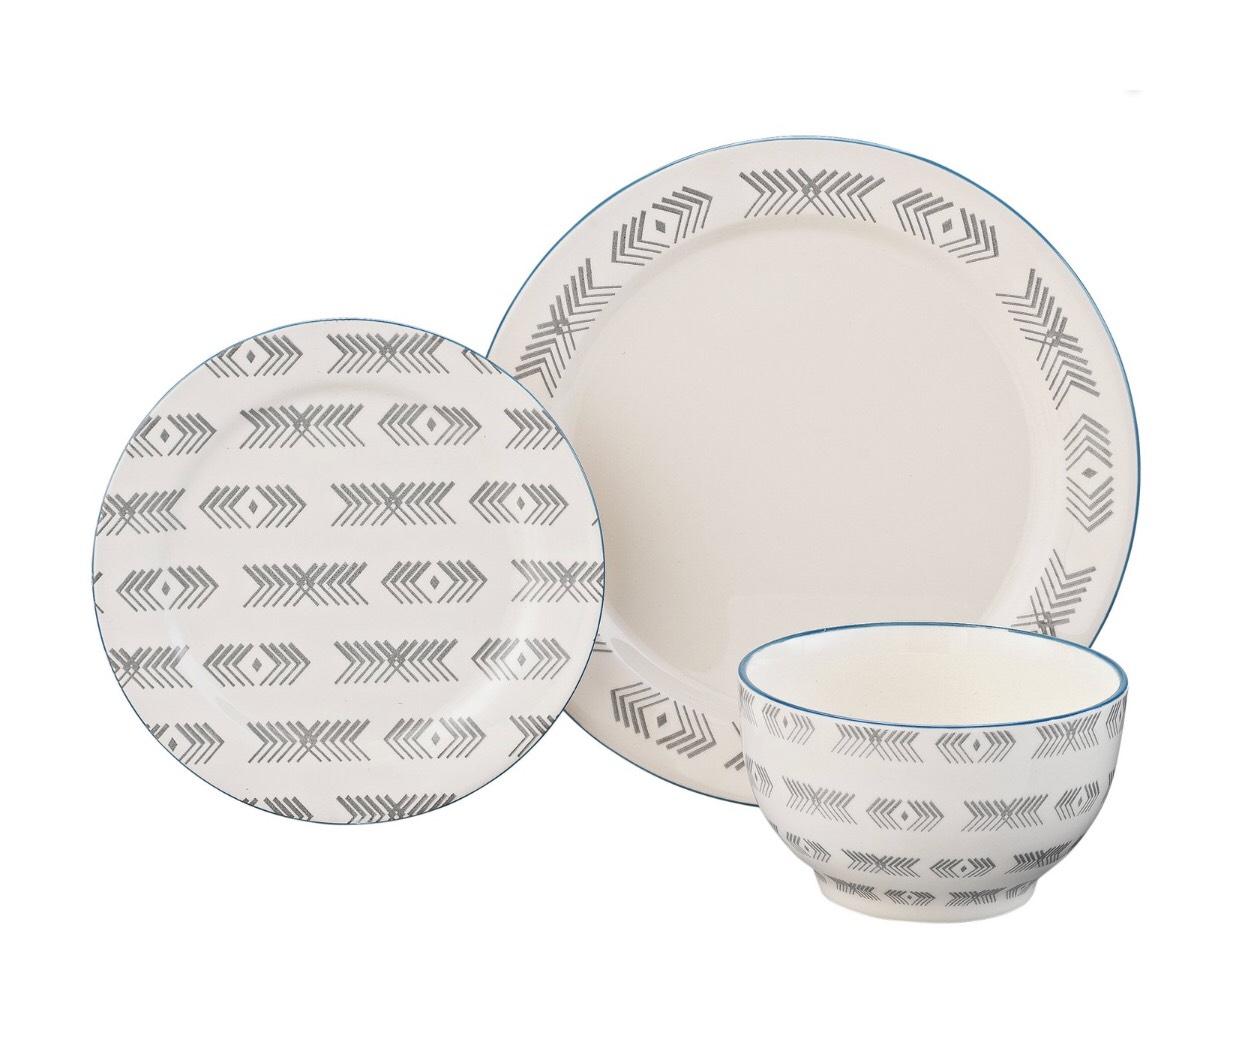 HOME Kilim 12 Piece Stoneware Dinner Set £11.49 Argos (free C&C)